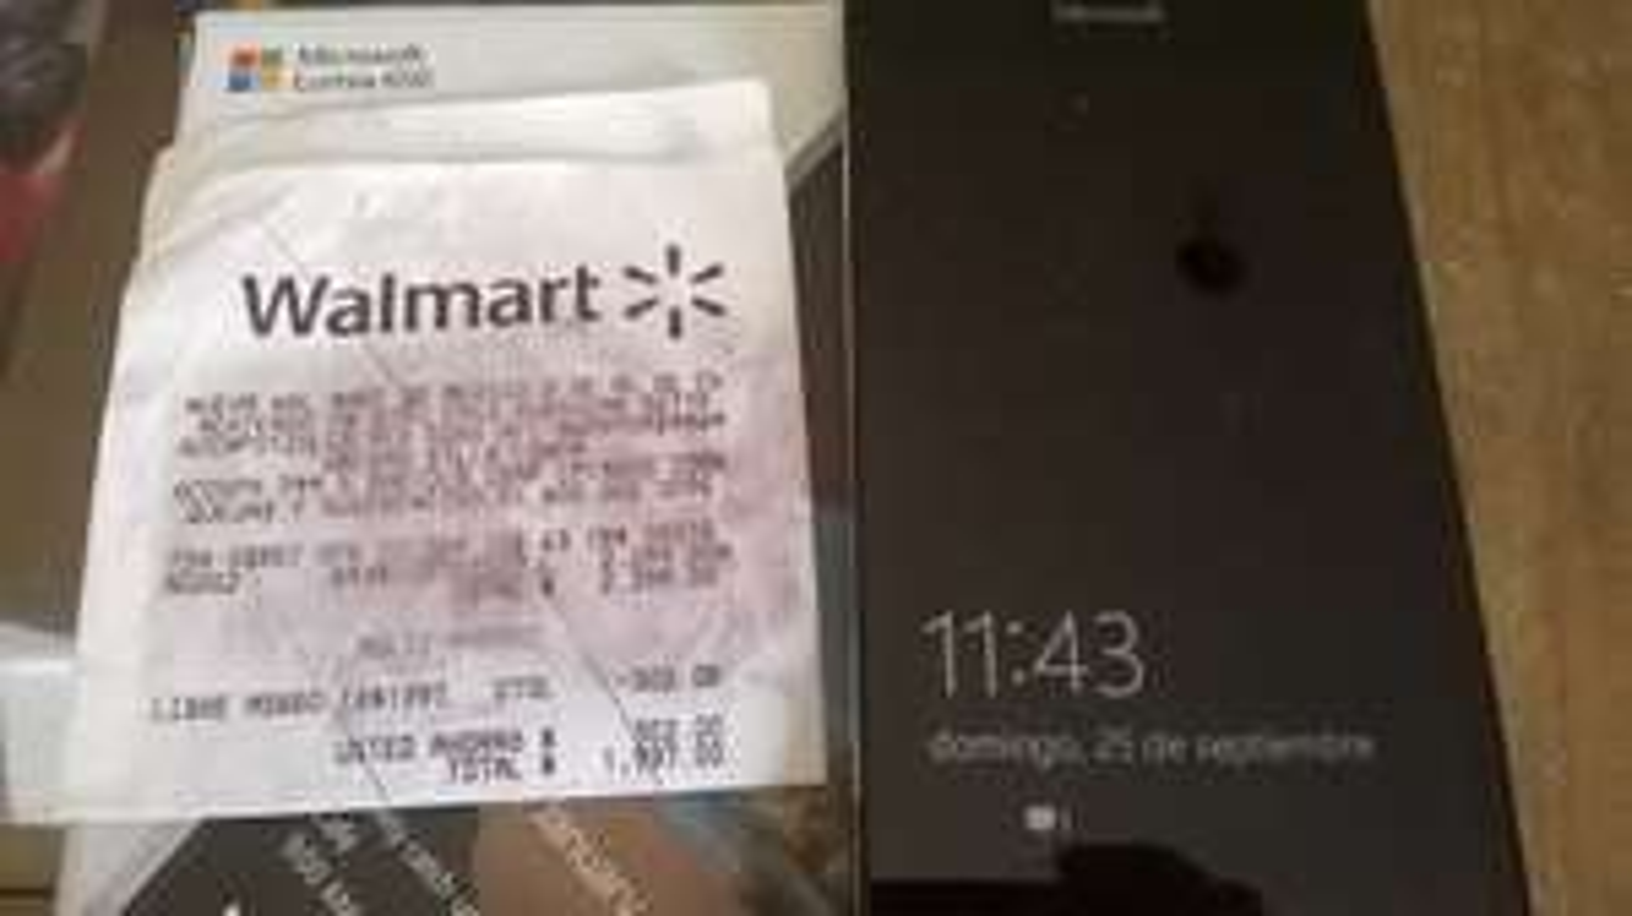 Walmart Villa Coapa: Lumia 650 negro